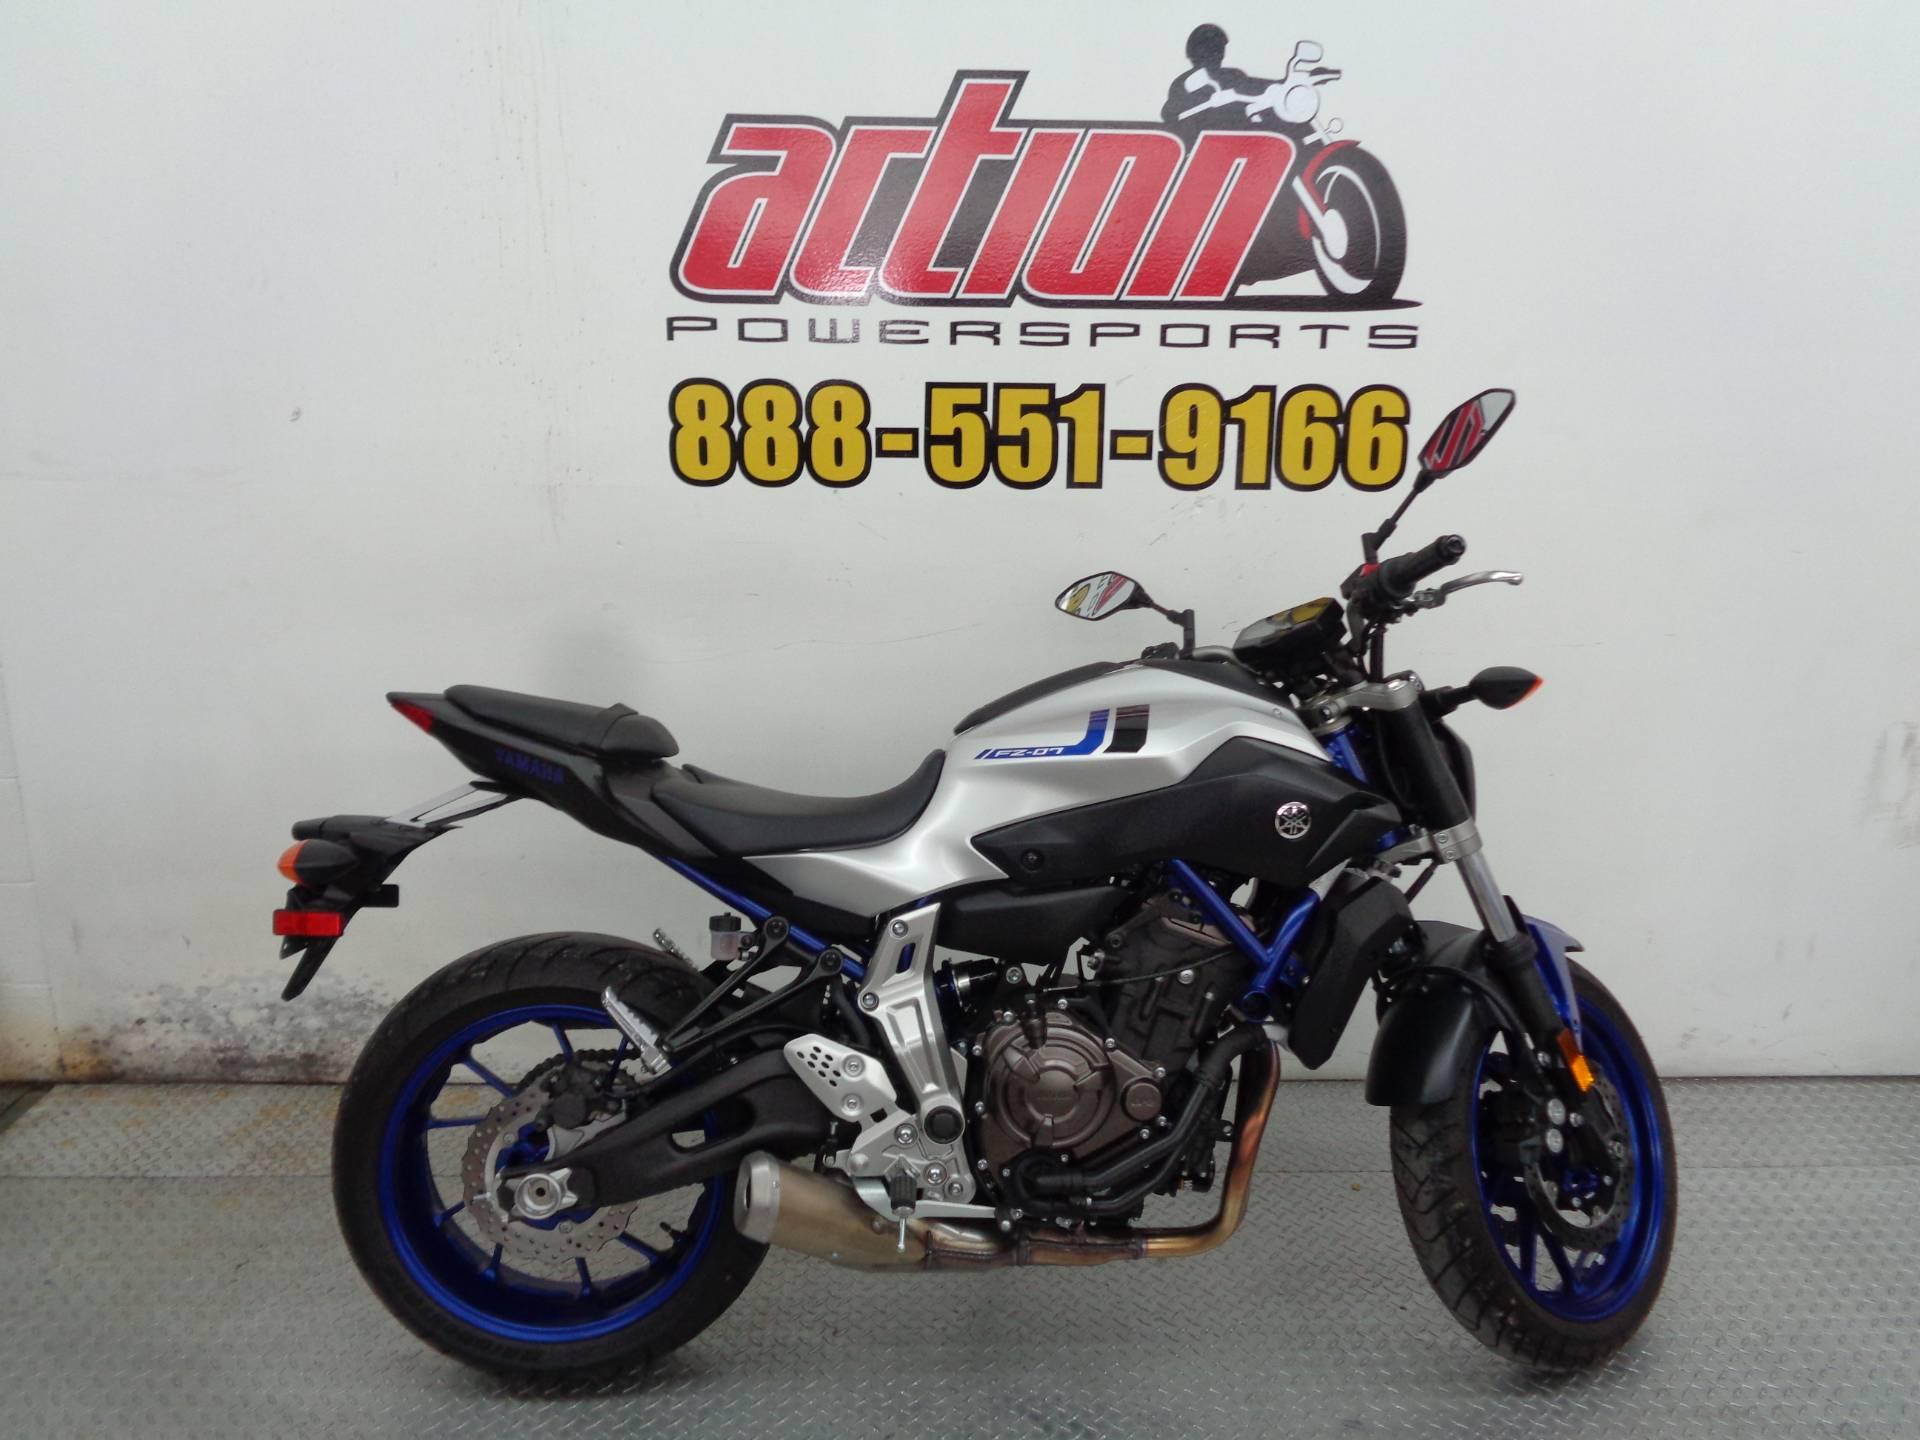 2016 Yamaha FZ-07 for sale 17979